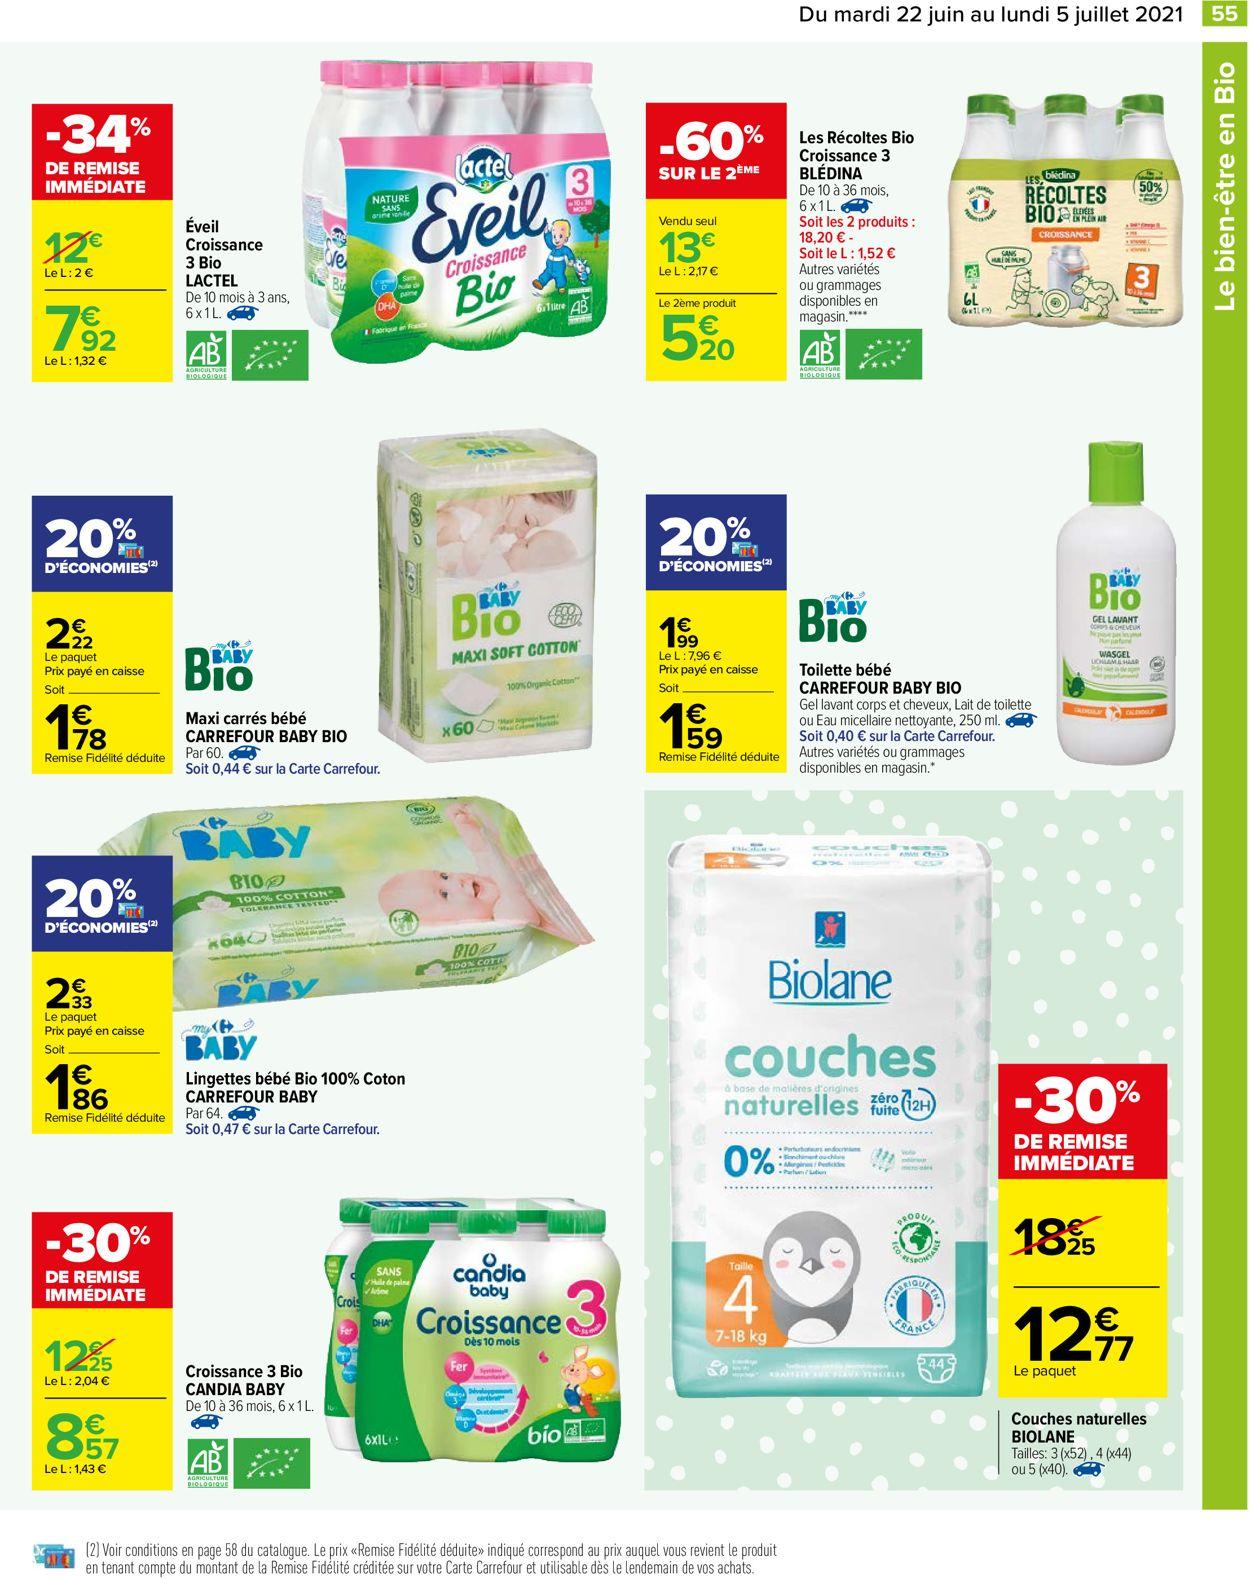 Carrefour Catalogue - 22.06-05.07.2021 (Page 55)